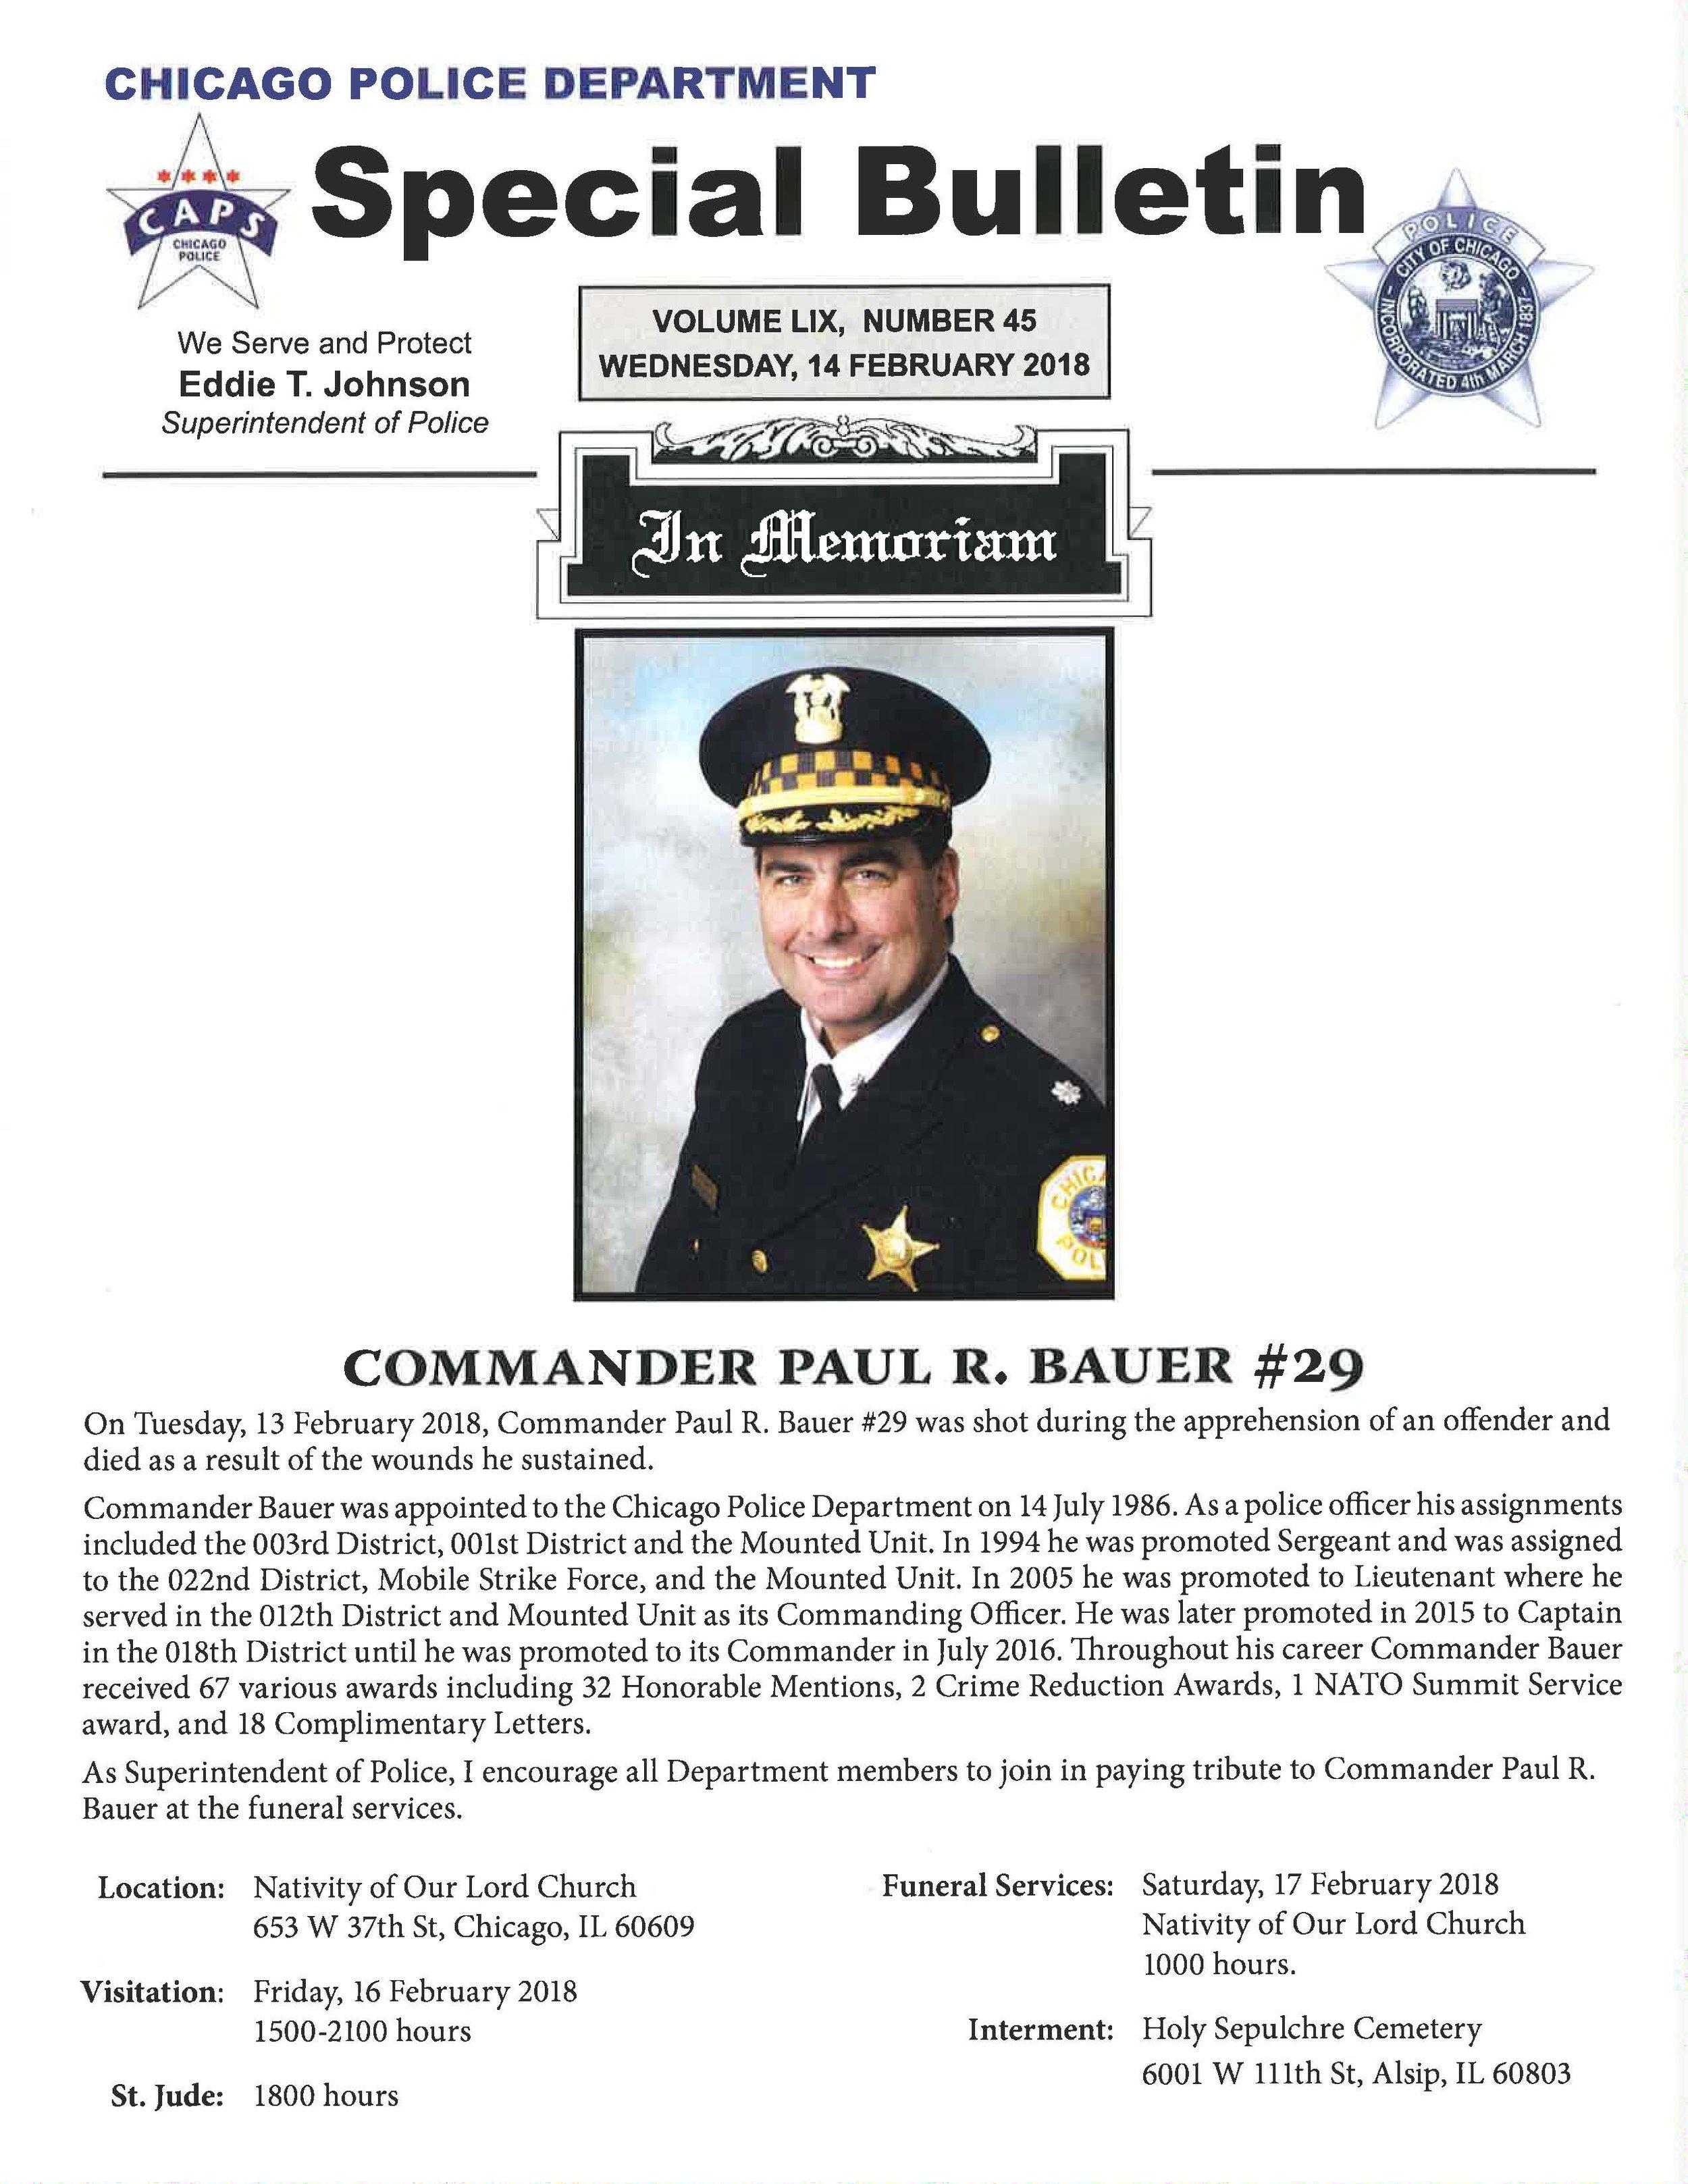 14-FEB-18-Special-Bulletin-for-Commander-Paul-Bauer.jpg